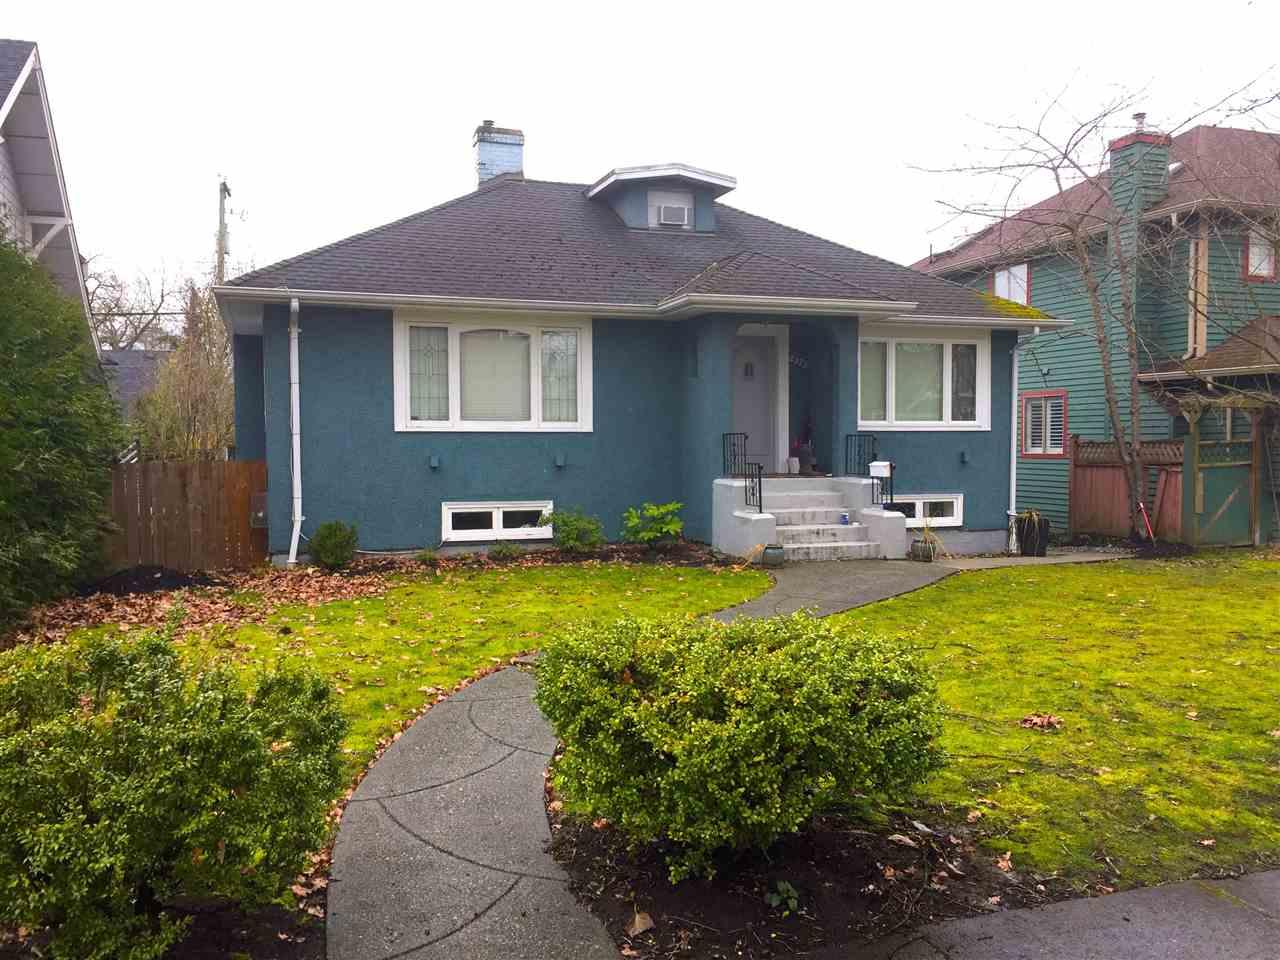 2375 W 13TH AVENUE, Vancouver, BC, V6K 2S5 Primary Photo